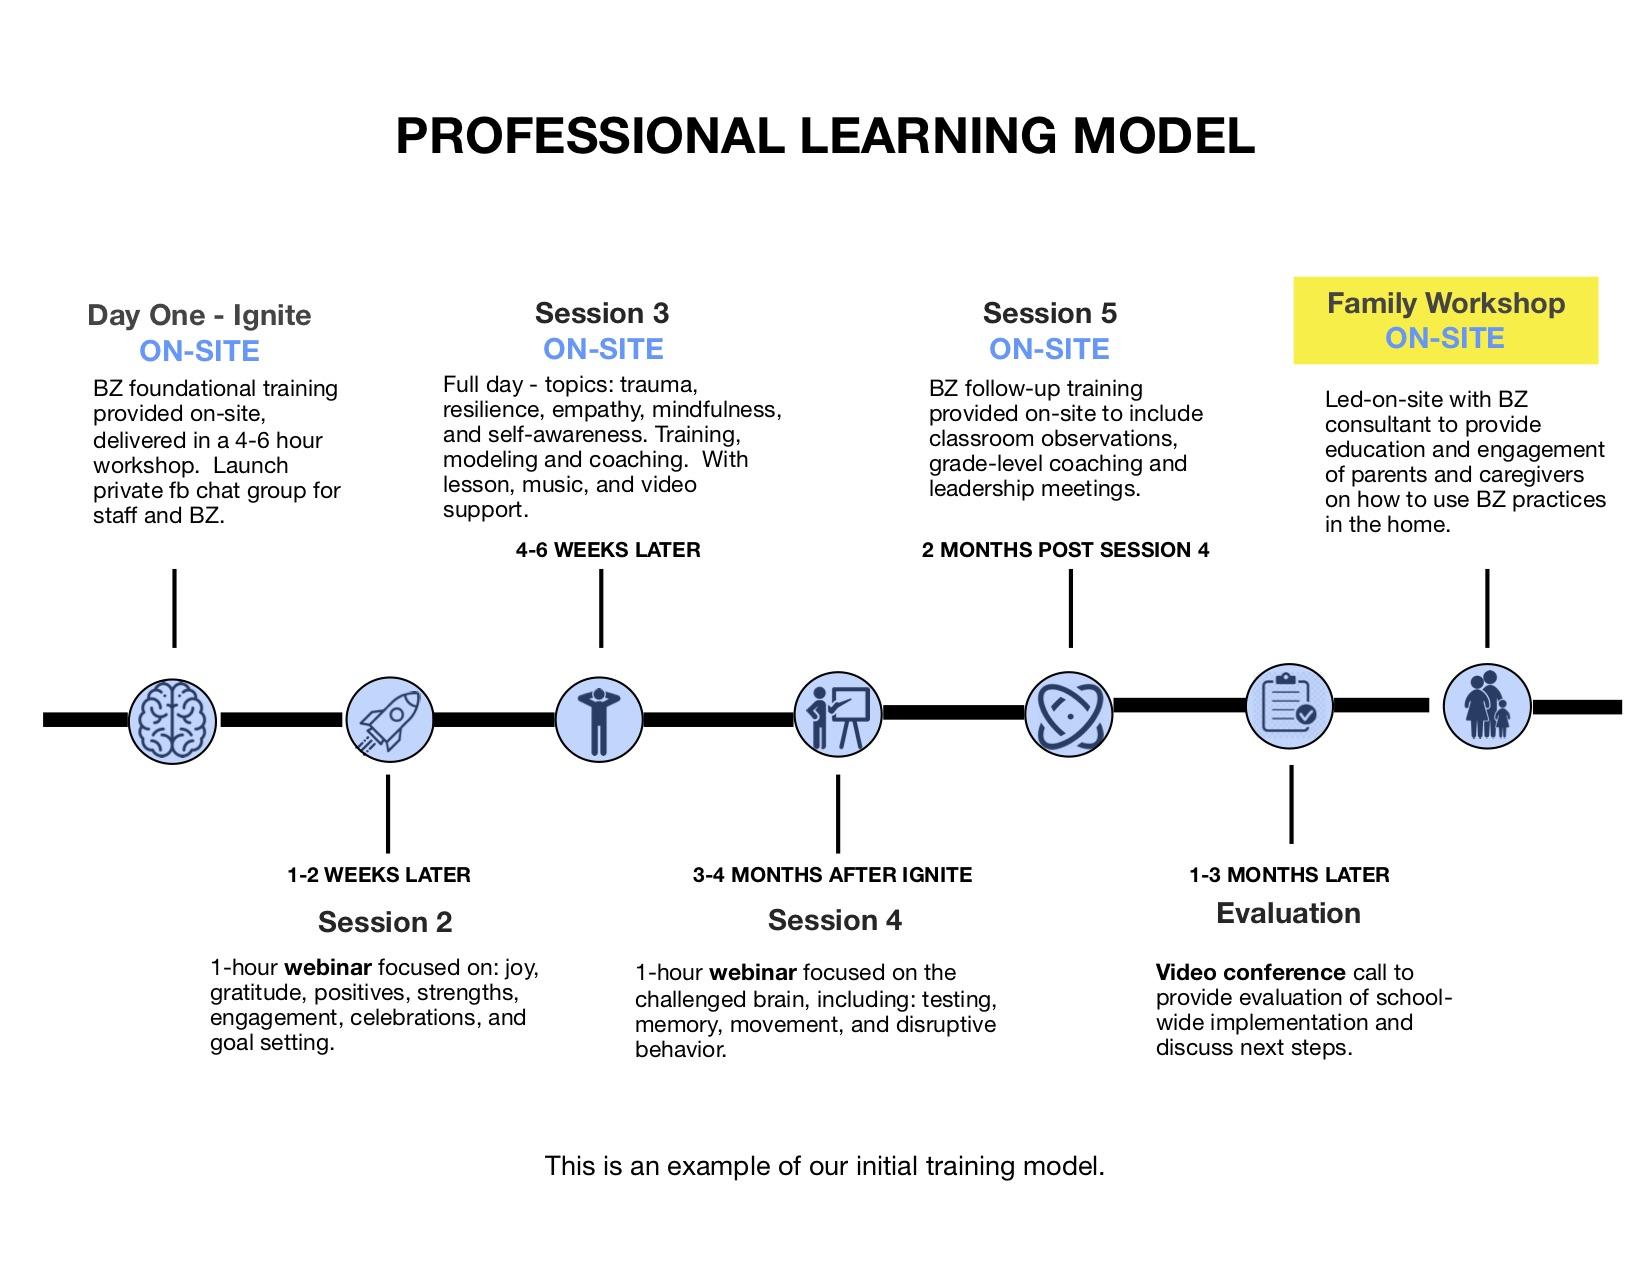 PROFESSIONAL LEARNING MODEL.jpg